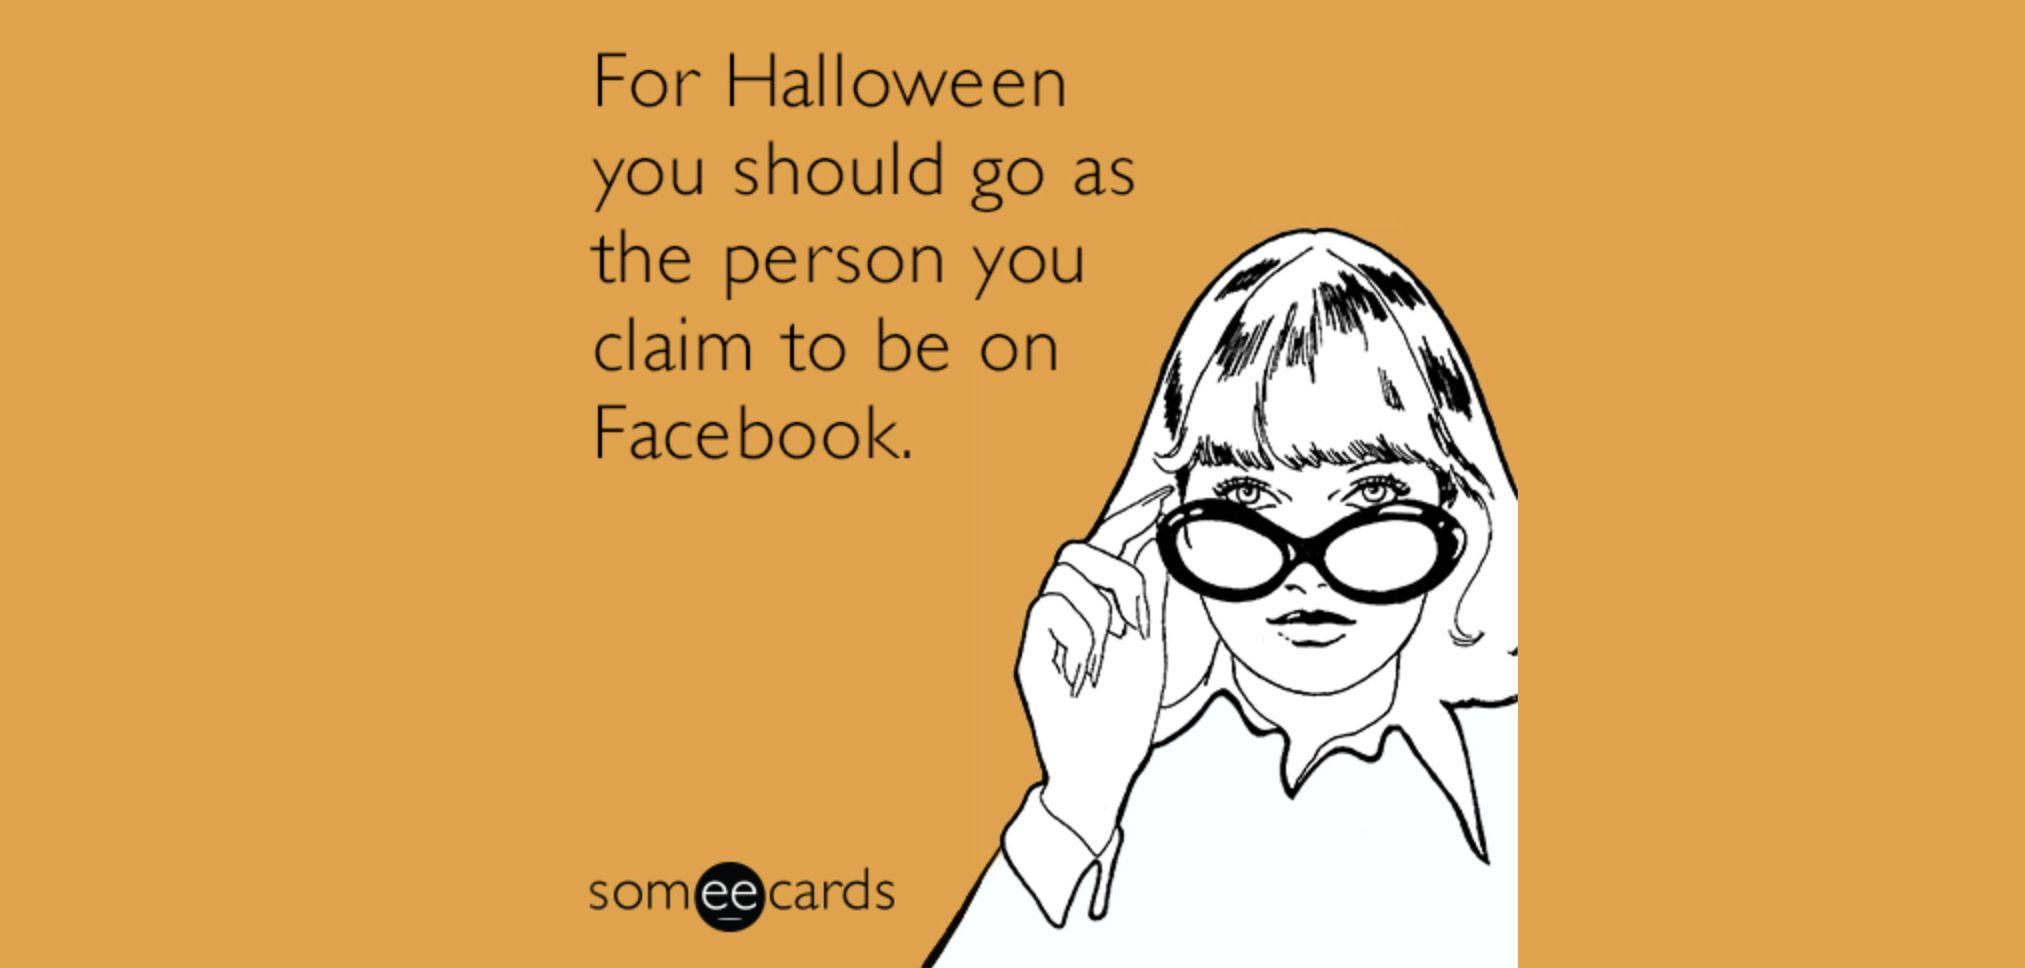 Facebook halloween meme